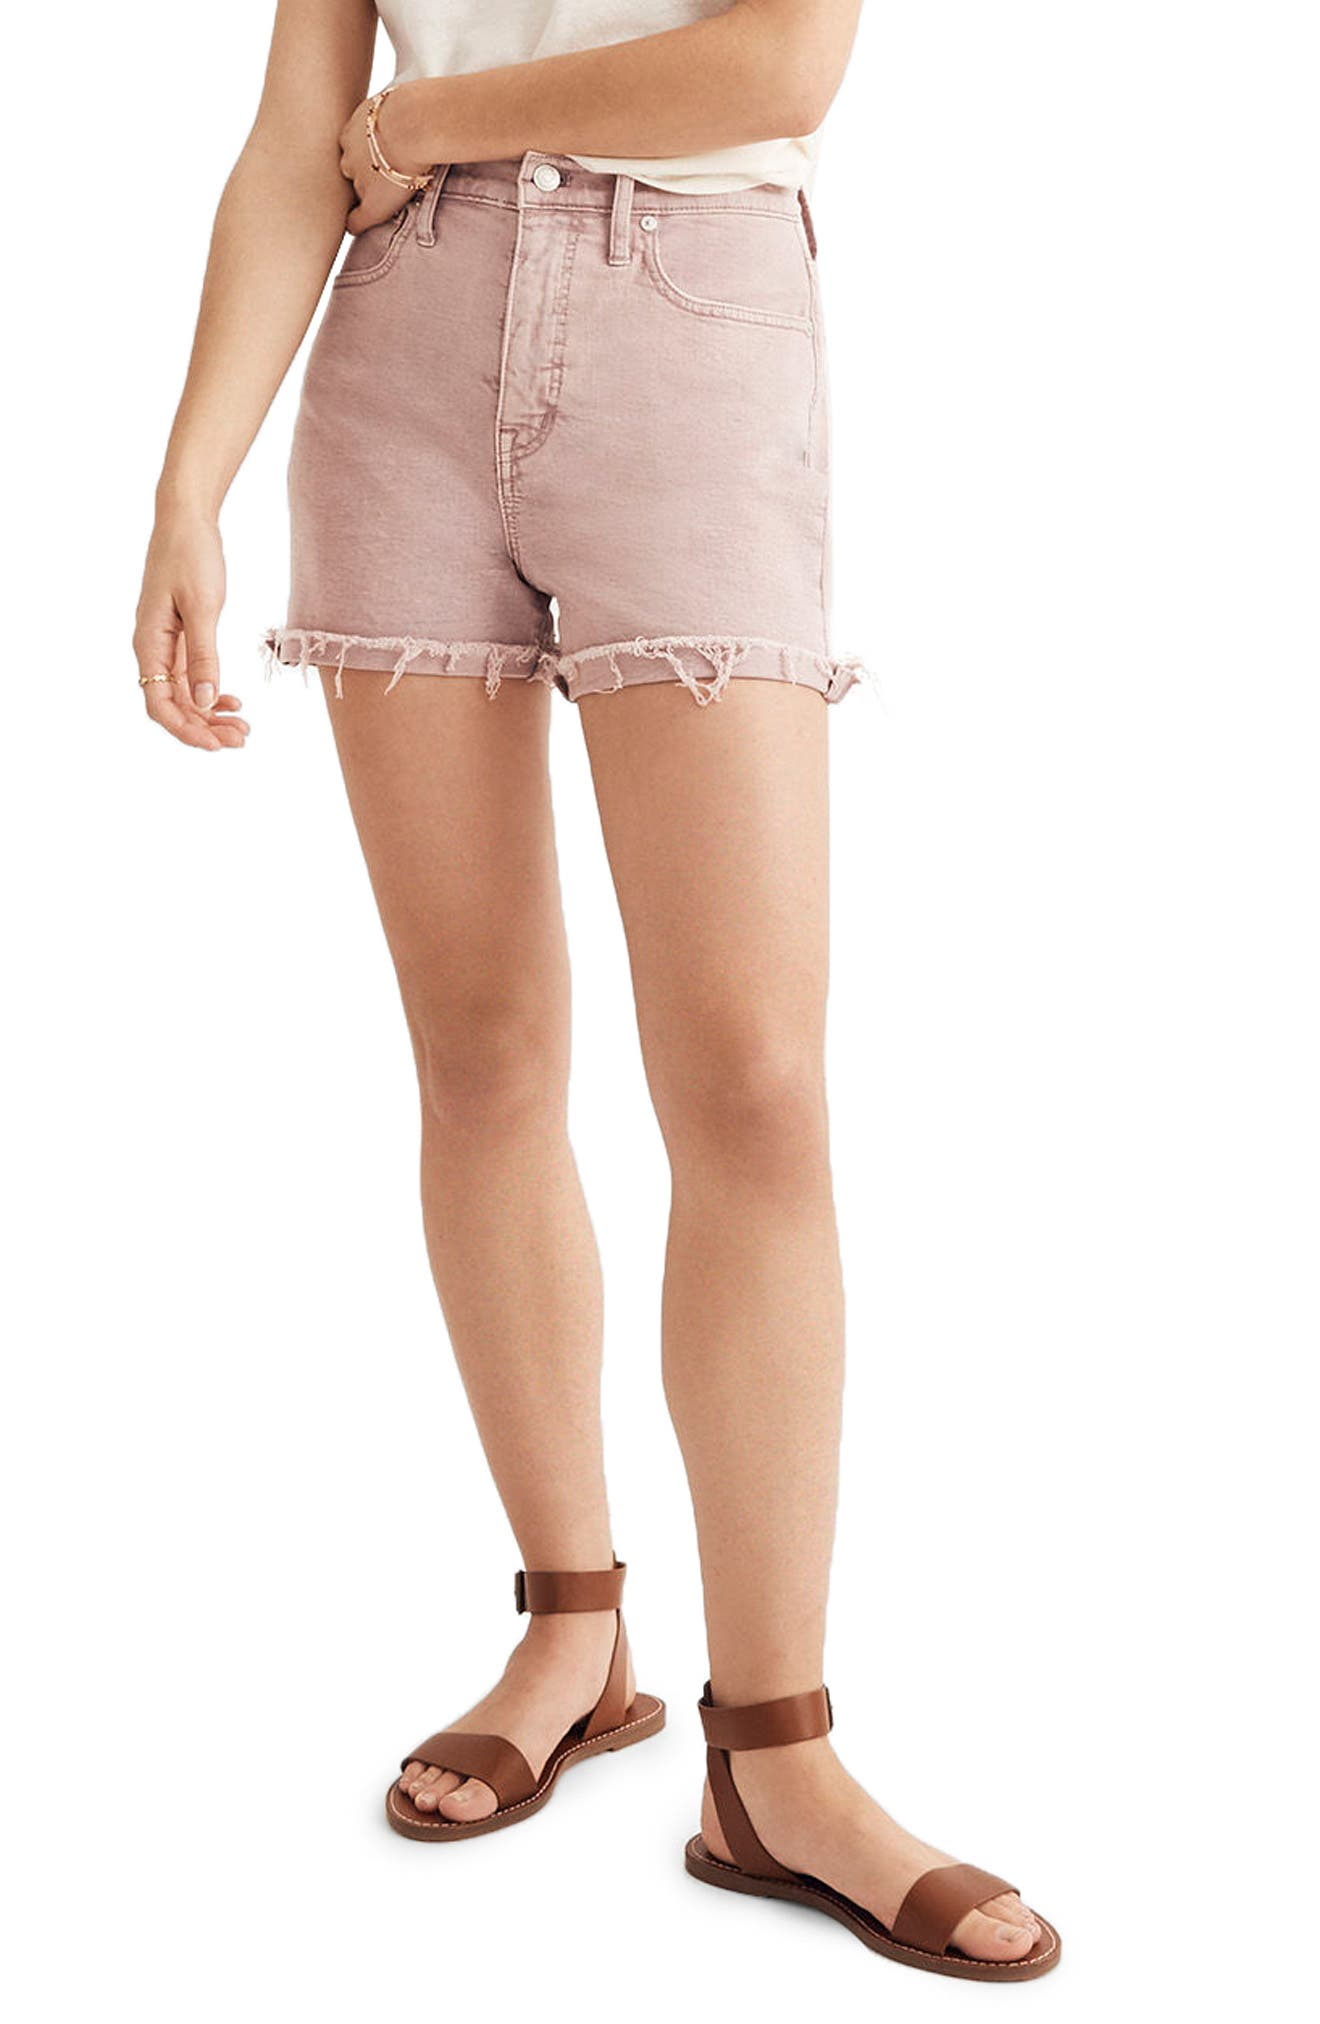 Garment Dyed High Waist Denim Shorts,                             Main thumbnail 1, color,                             Vintage Mauve